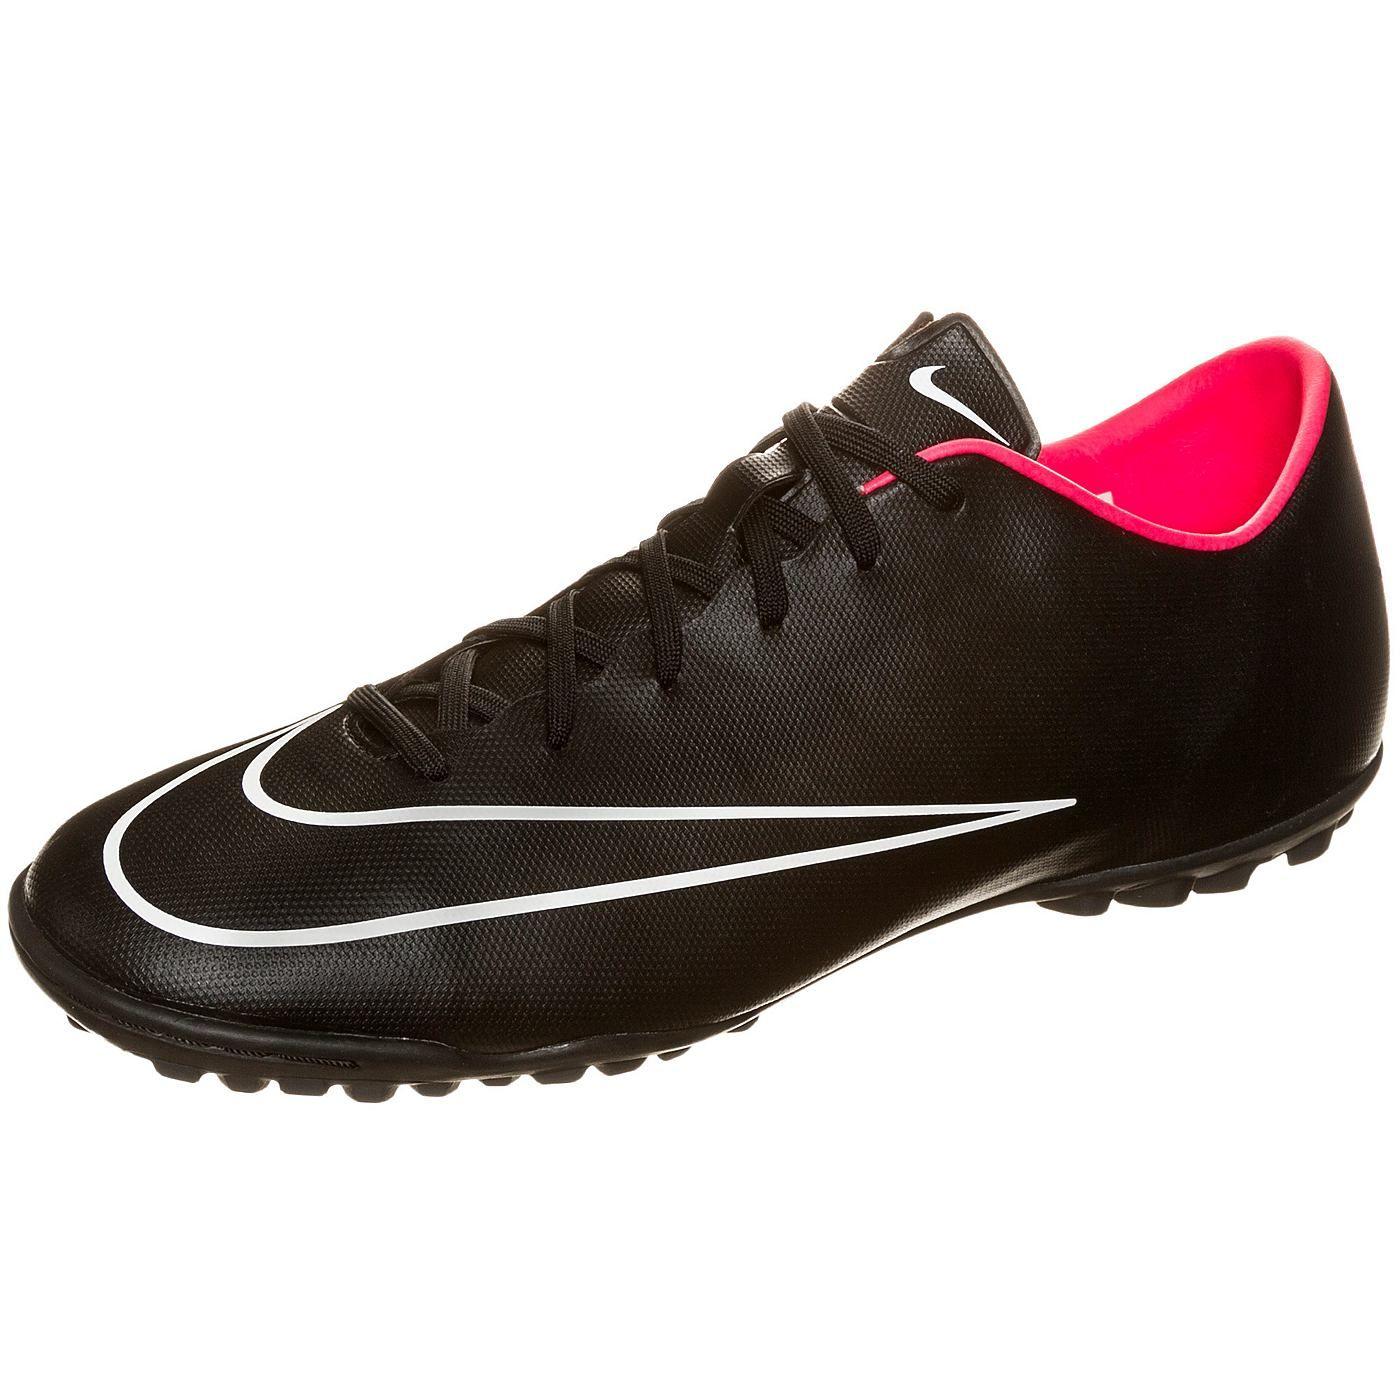 Nike Mercurial Victory Vi Neymar Fussballschuh Nike